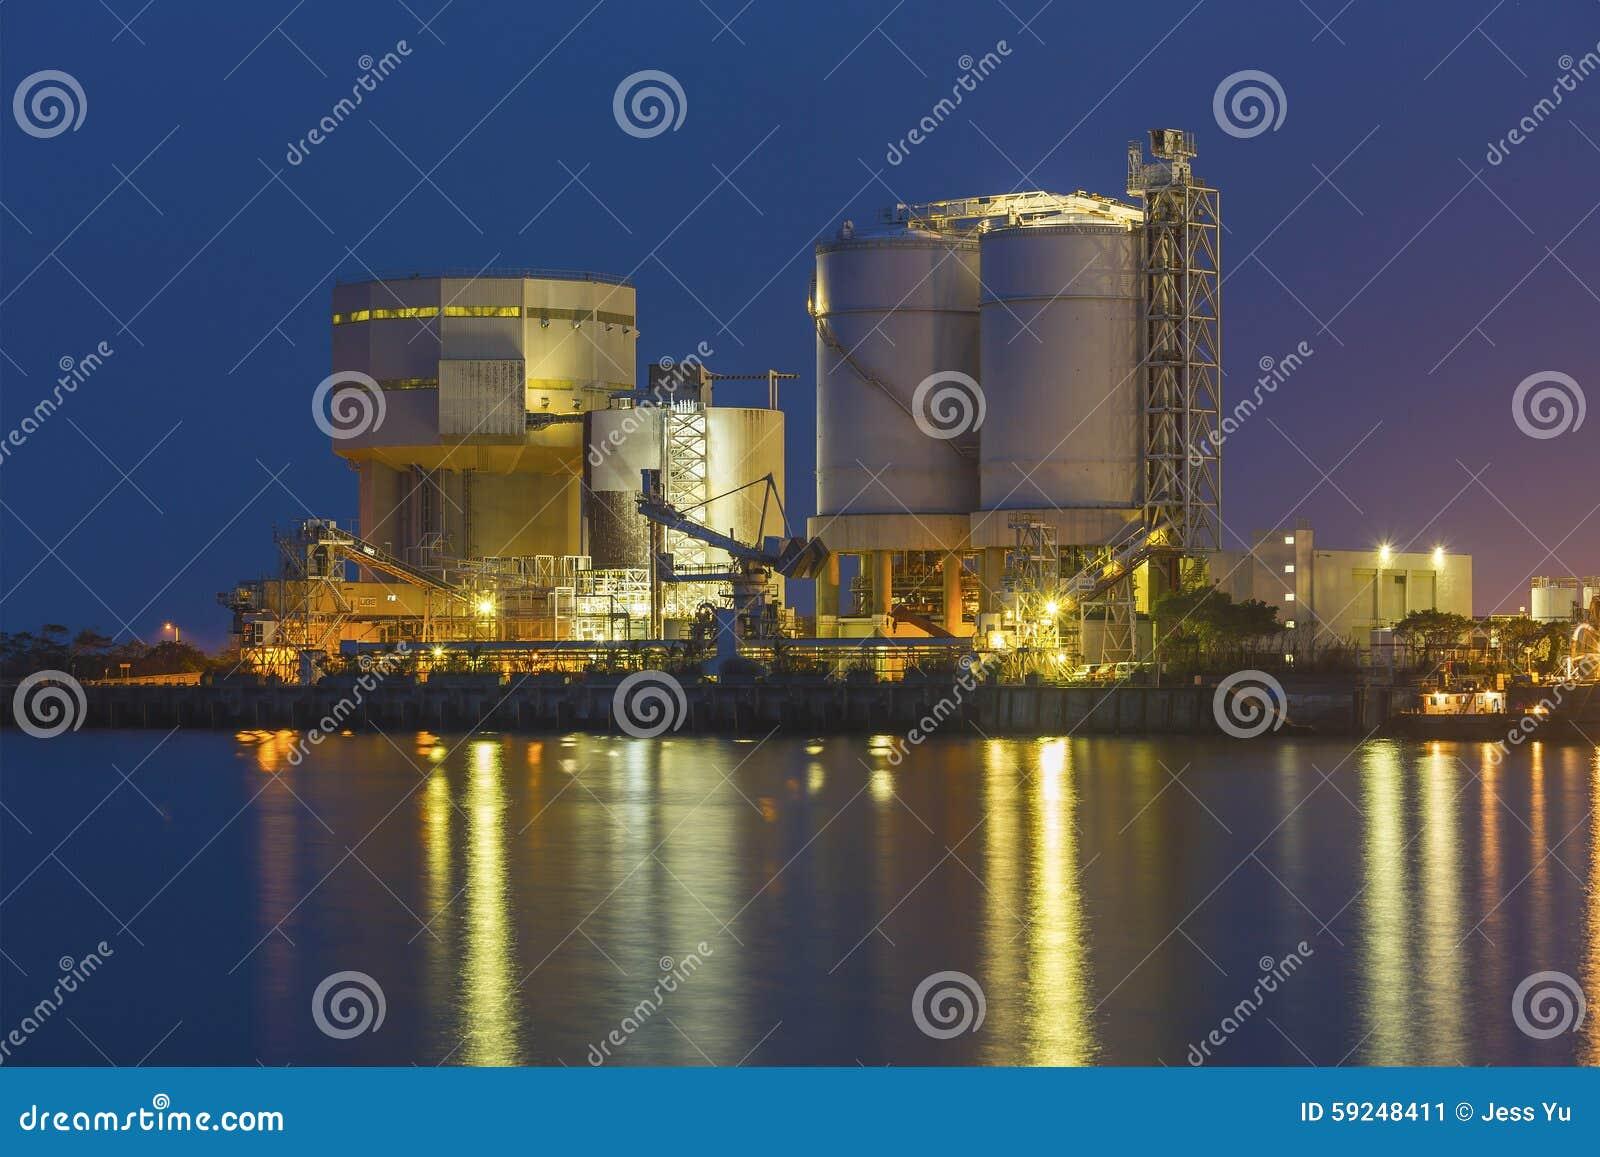 Planta industrial petroquímica